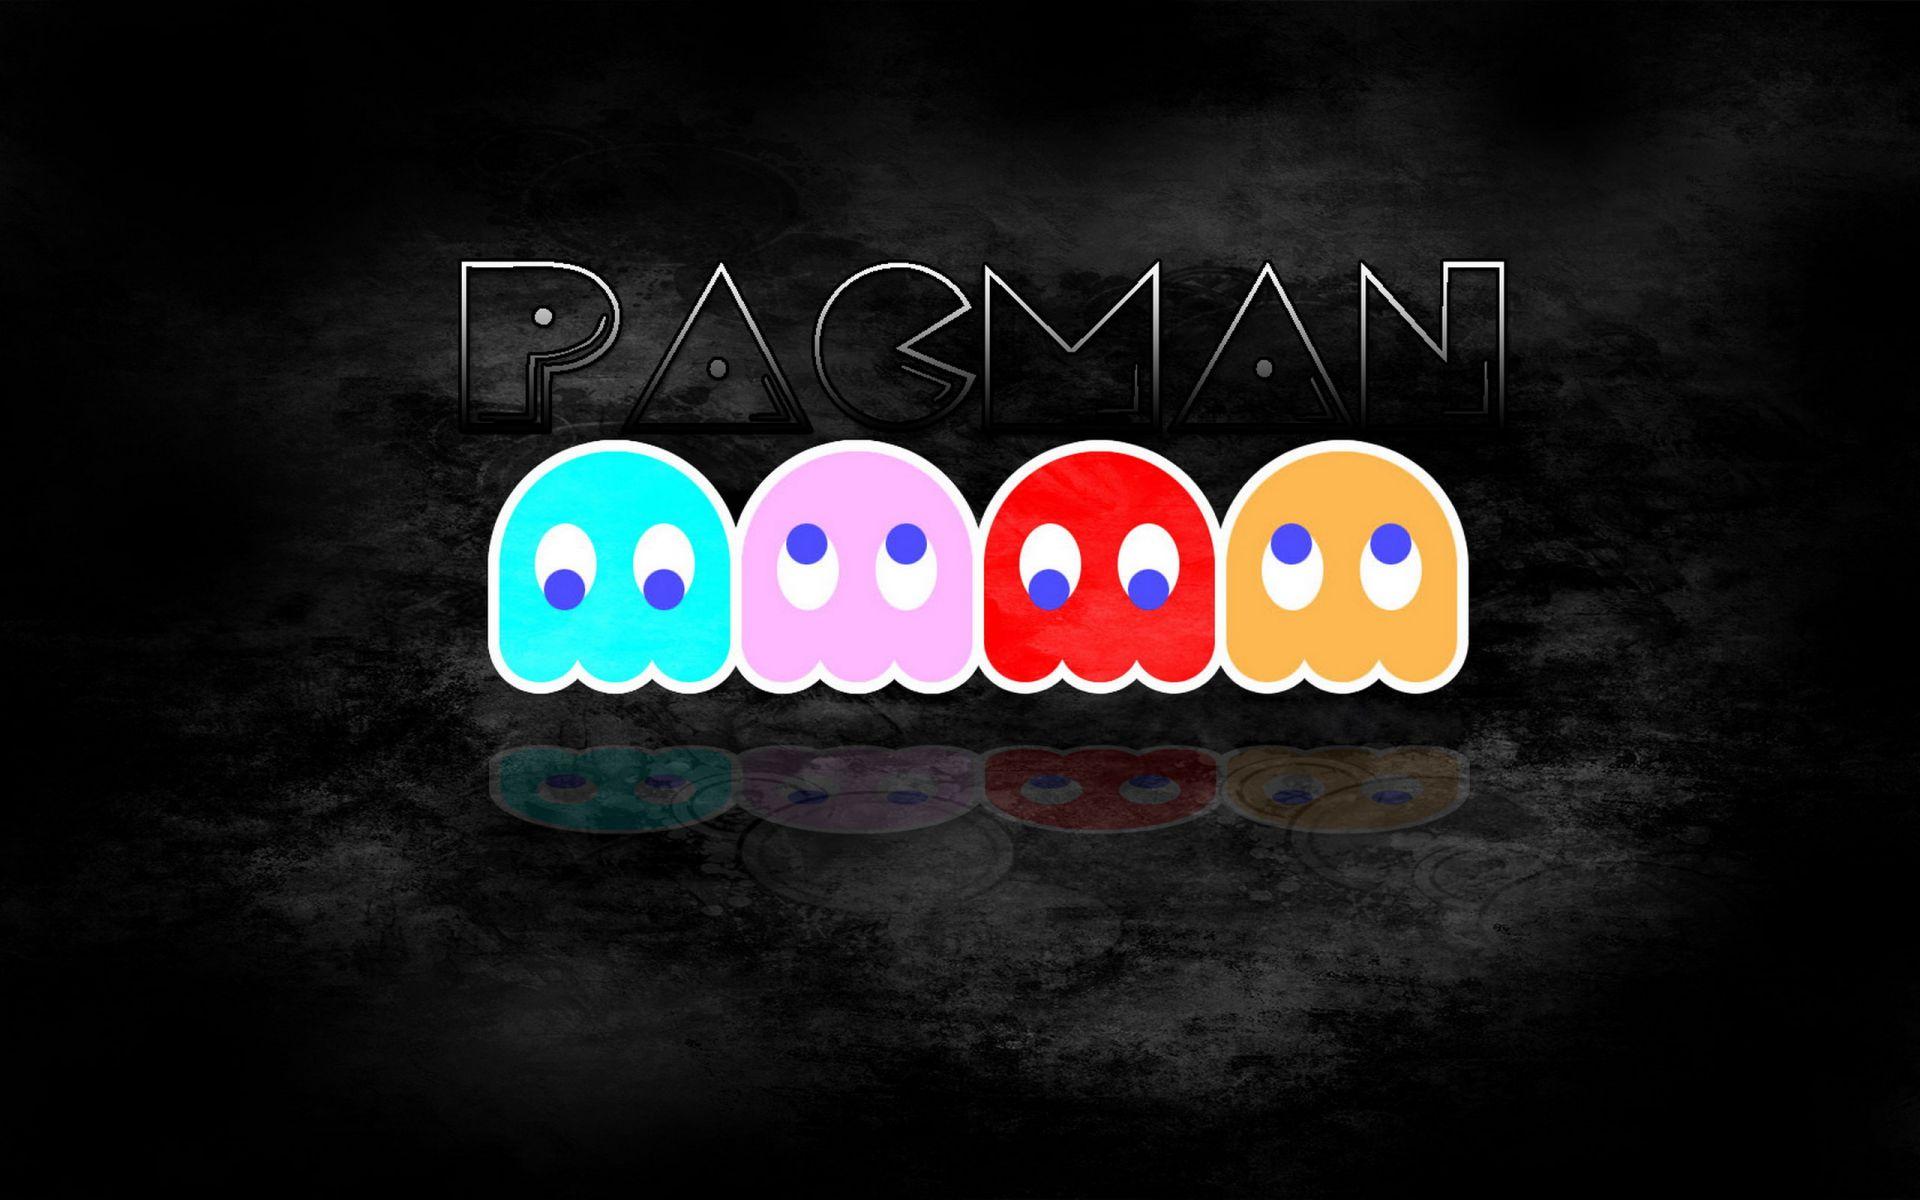 Inspirational Quotes For Desktop Wallpaper Hd Pacman Backgrounds Hd Pixelstalk Net